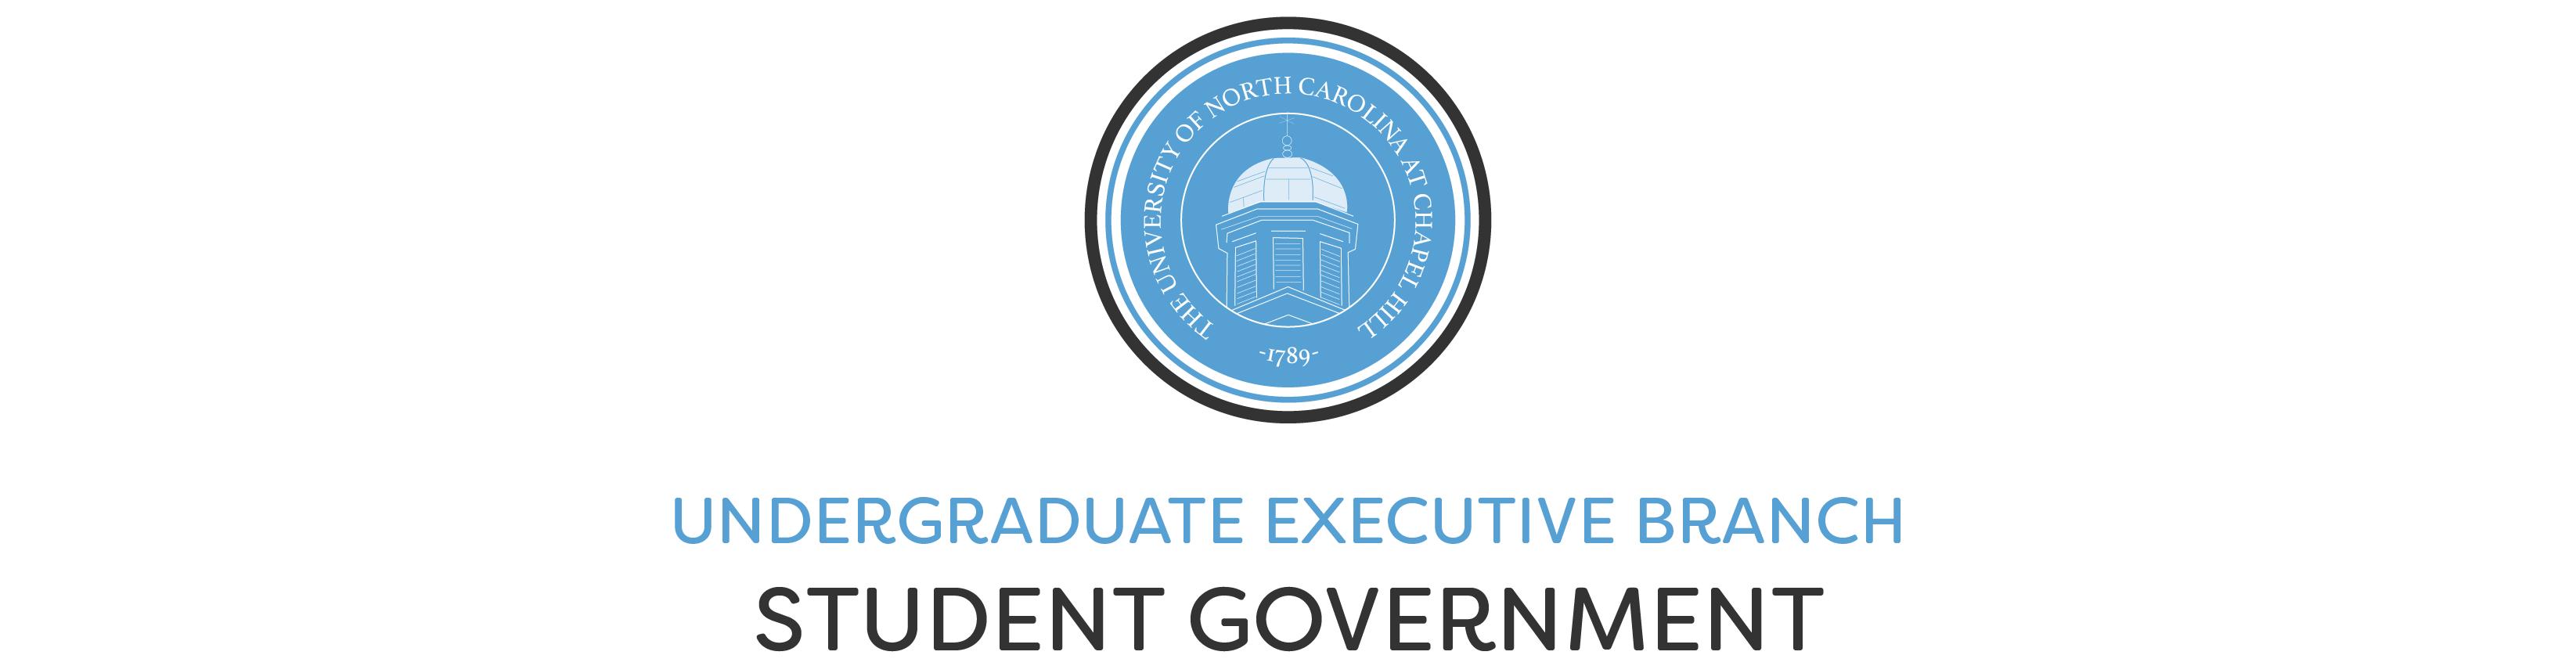 Undergraduate Executive Branch of UNC Student Government